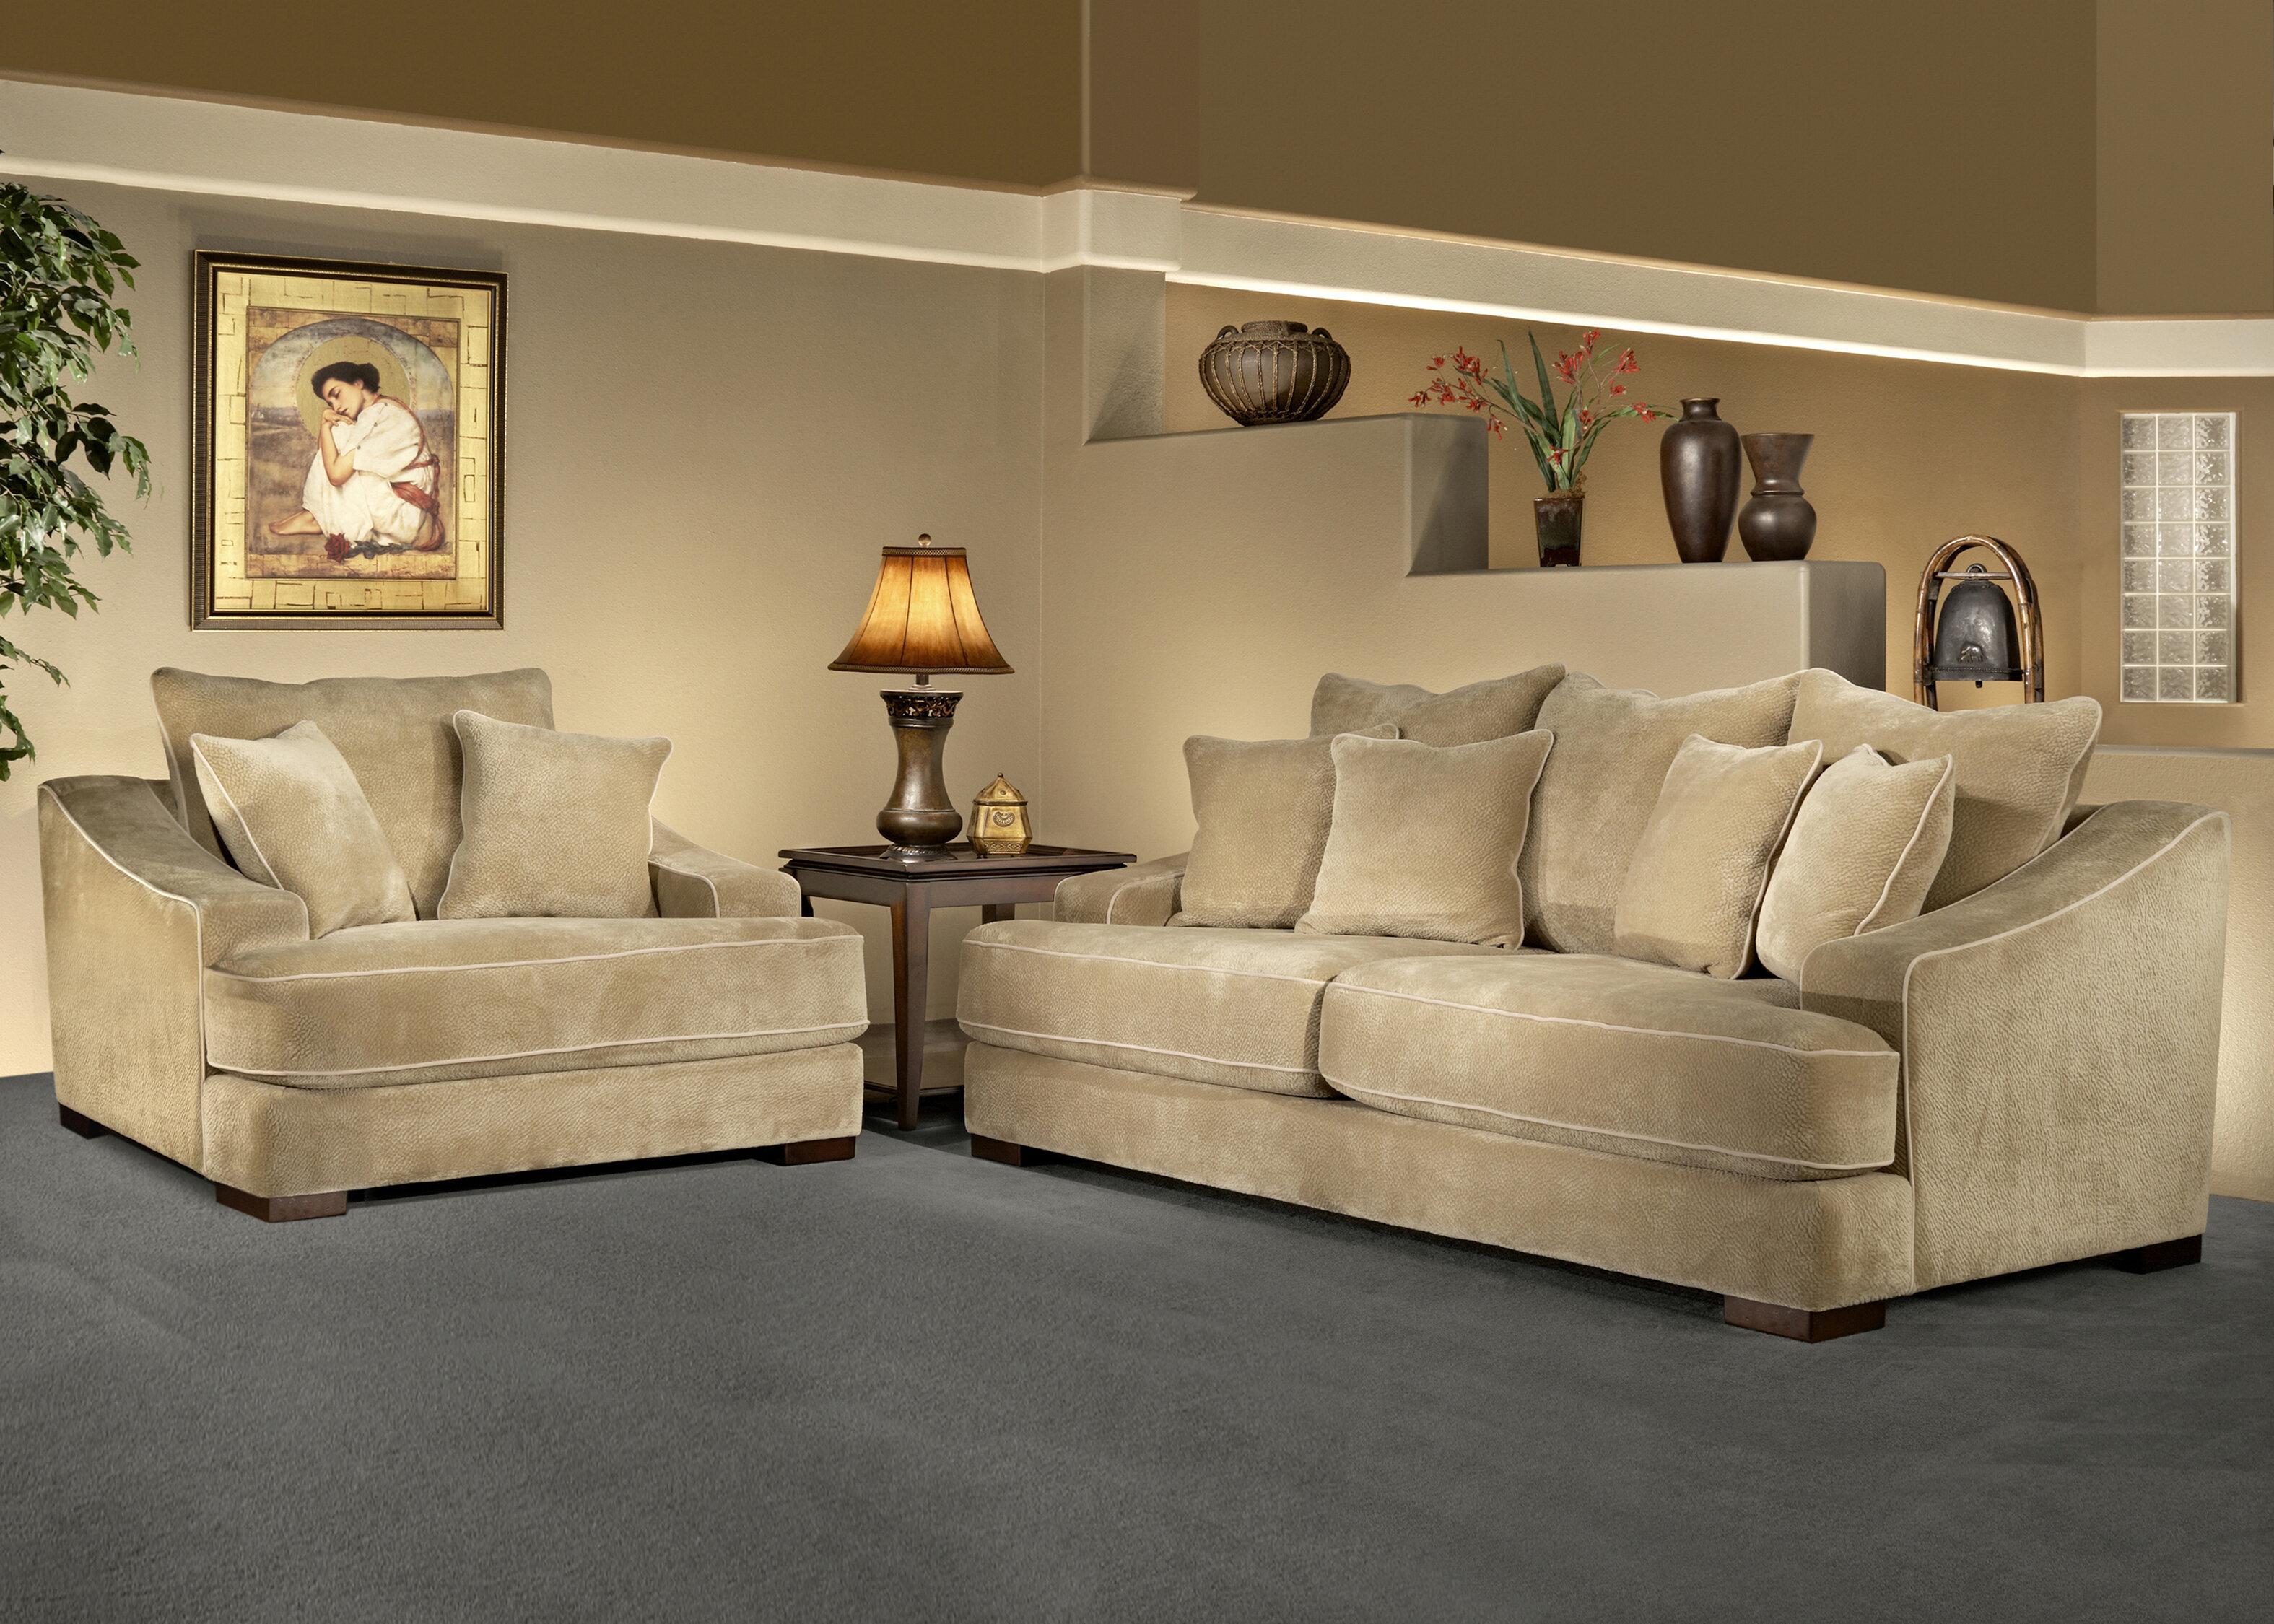 quick camo two sofa set living ca piece view loveseat room p